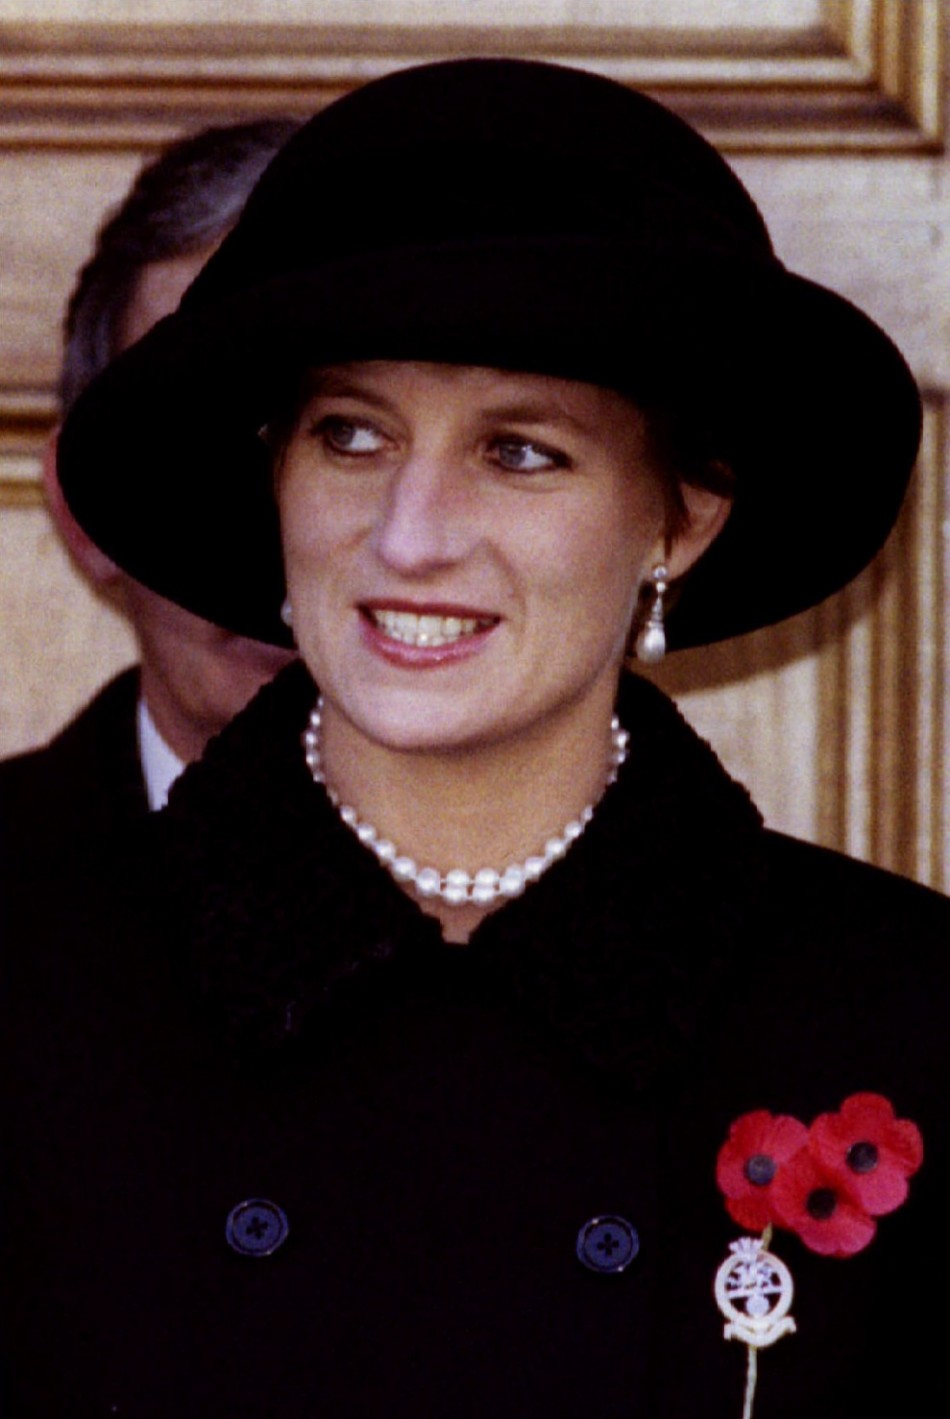 Princess Diana, Kate Moss and TIME's 100 Fashion Icons